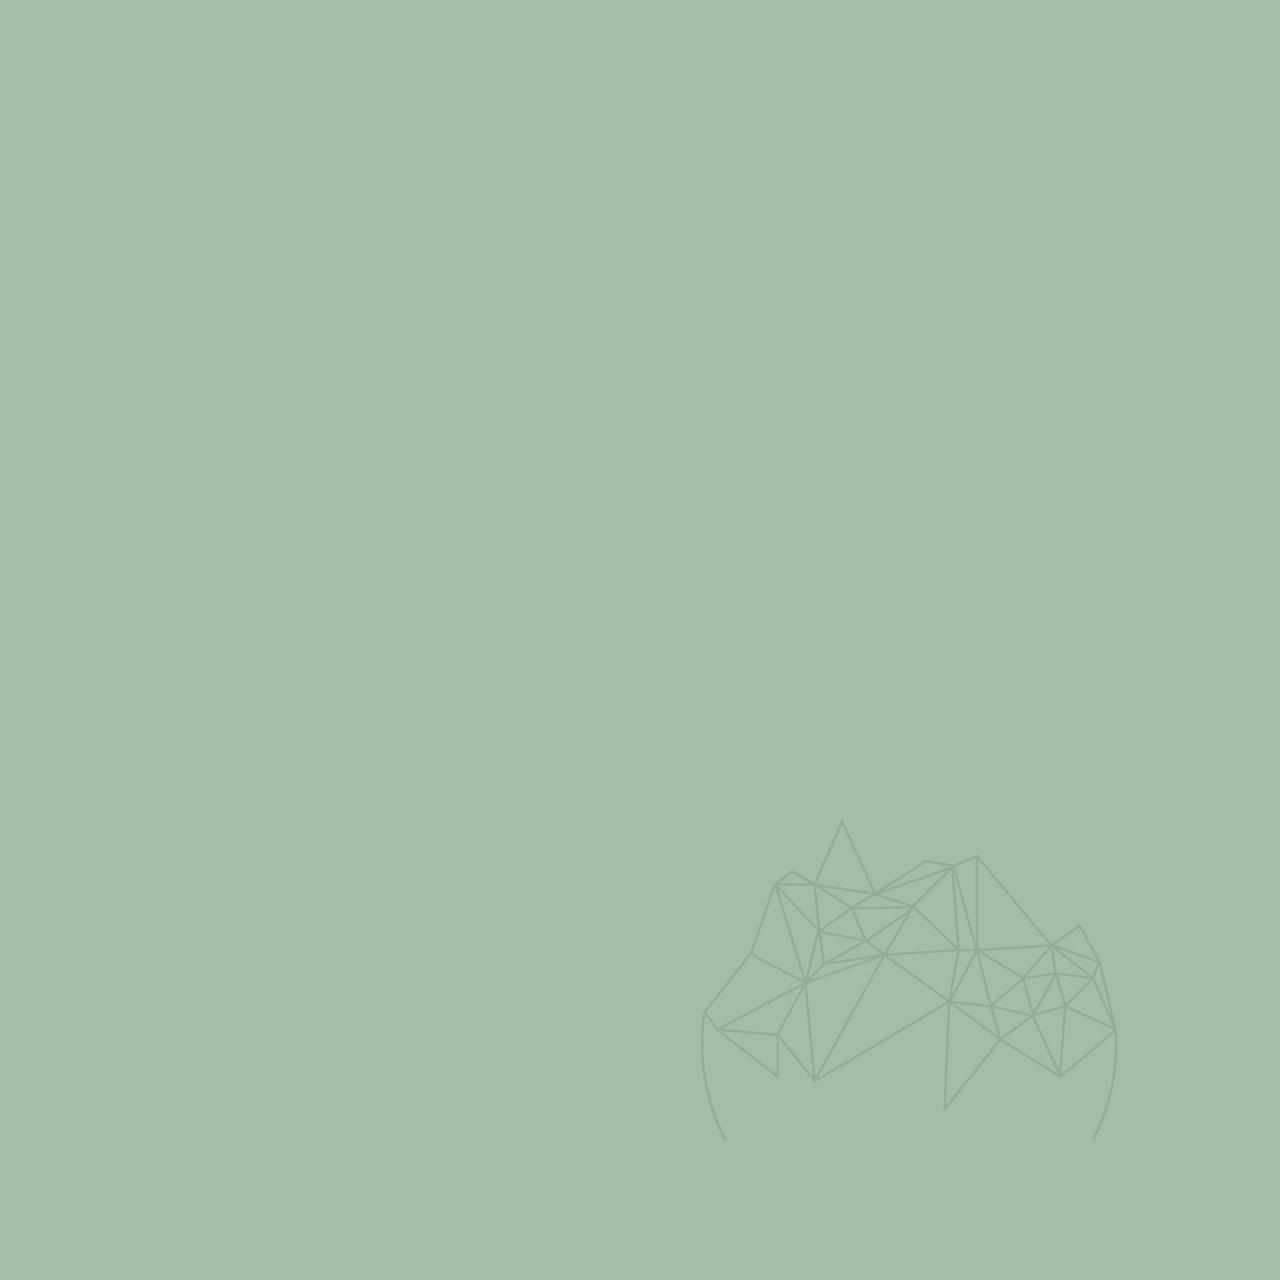 Weber Color Perfect Mint 2 KG - Flexible wall & floor grout